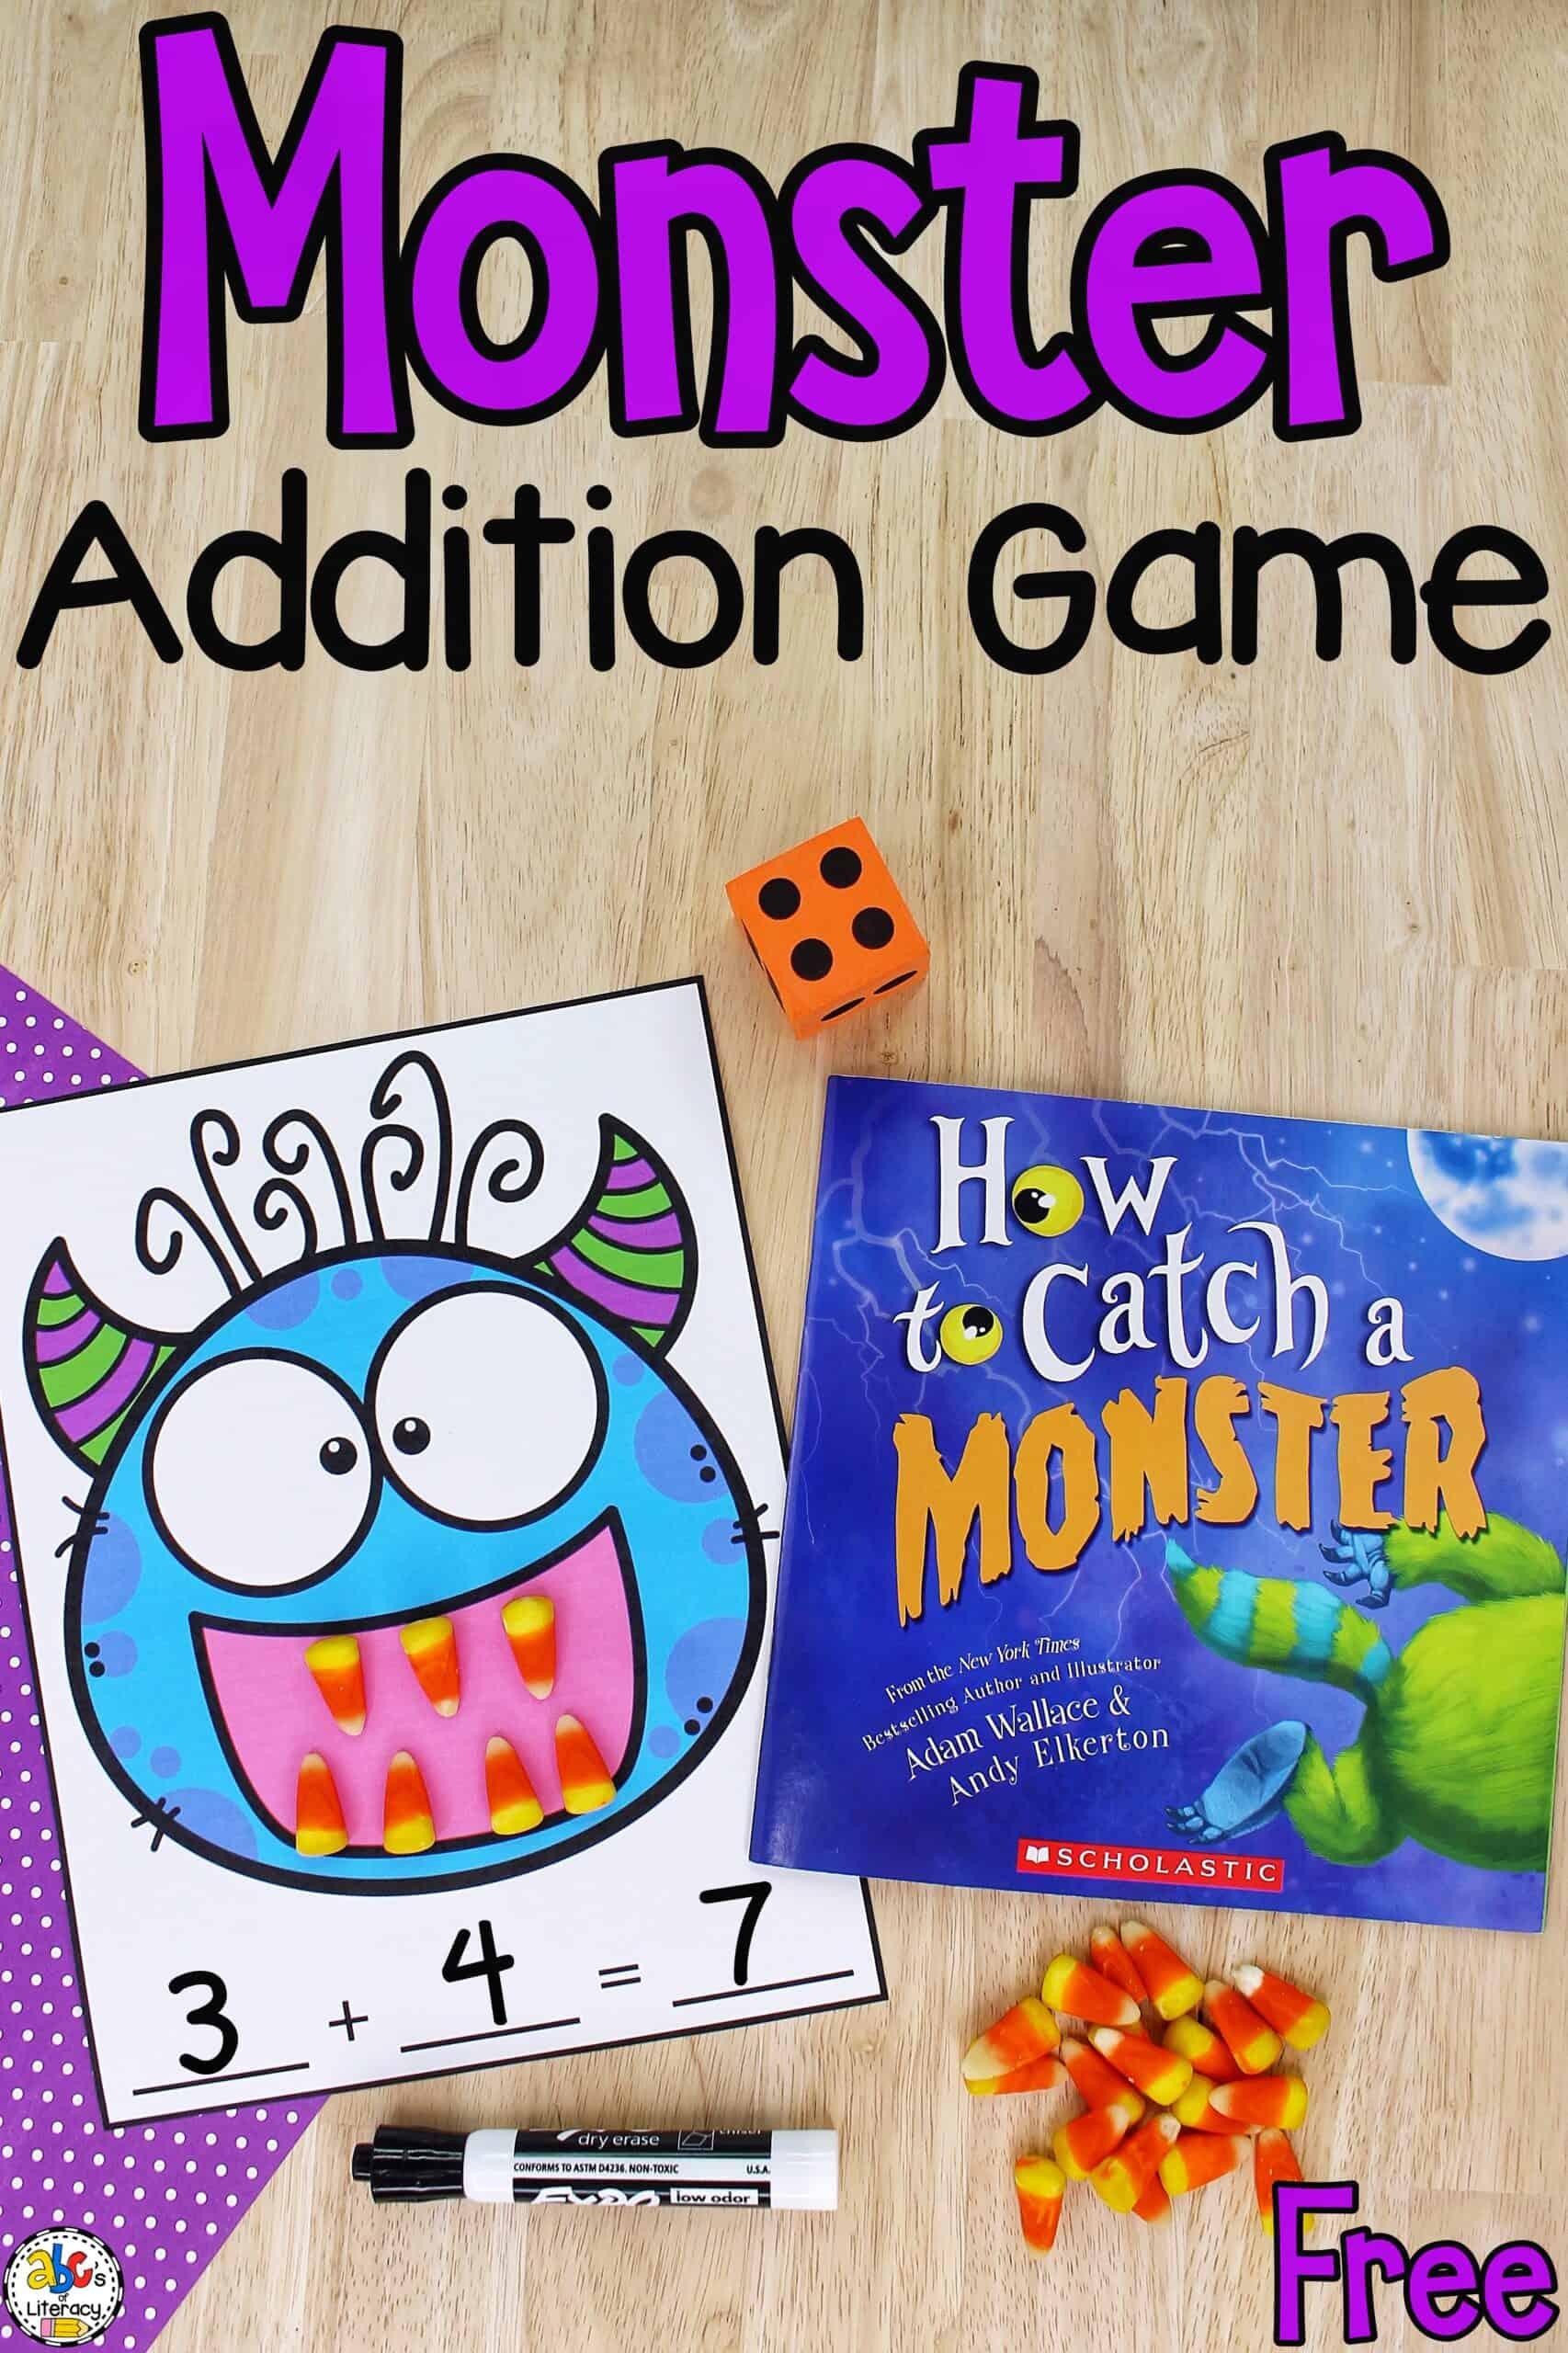 Monster Addition Game